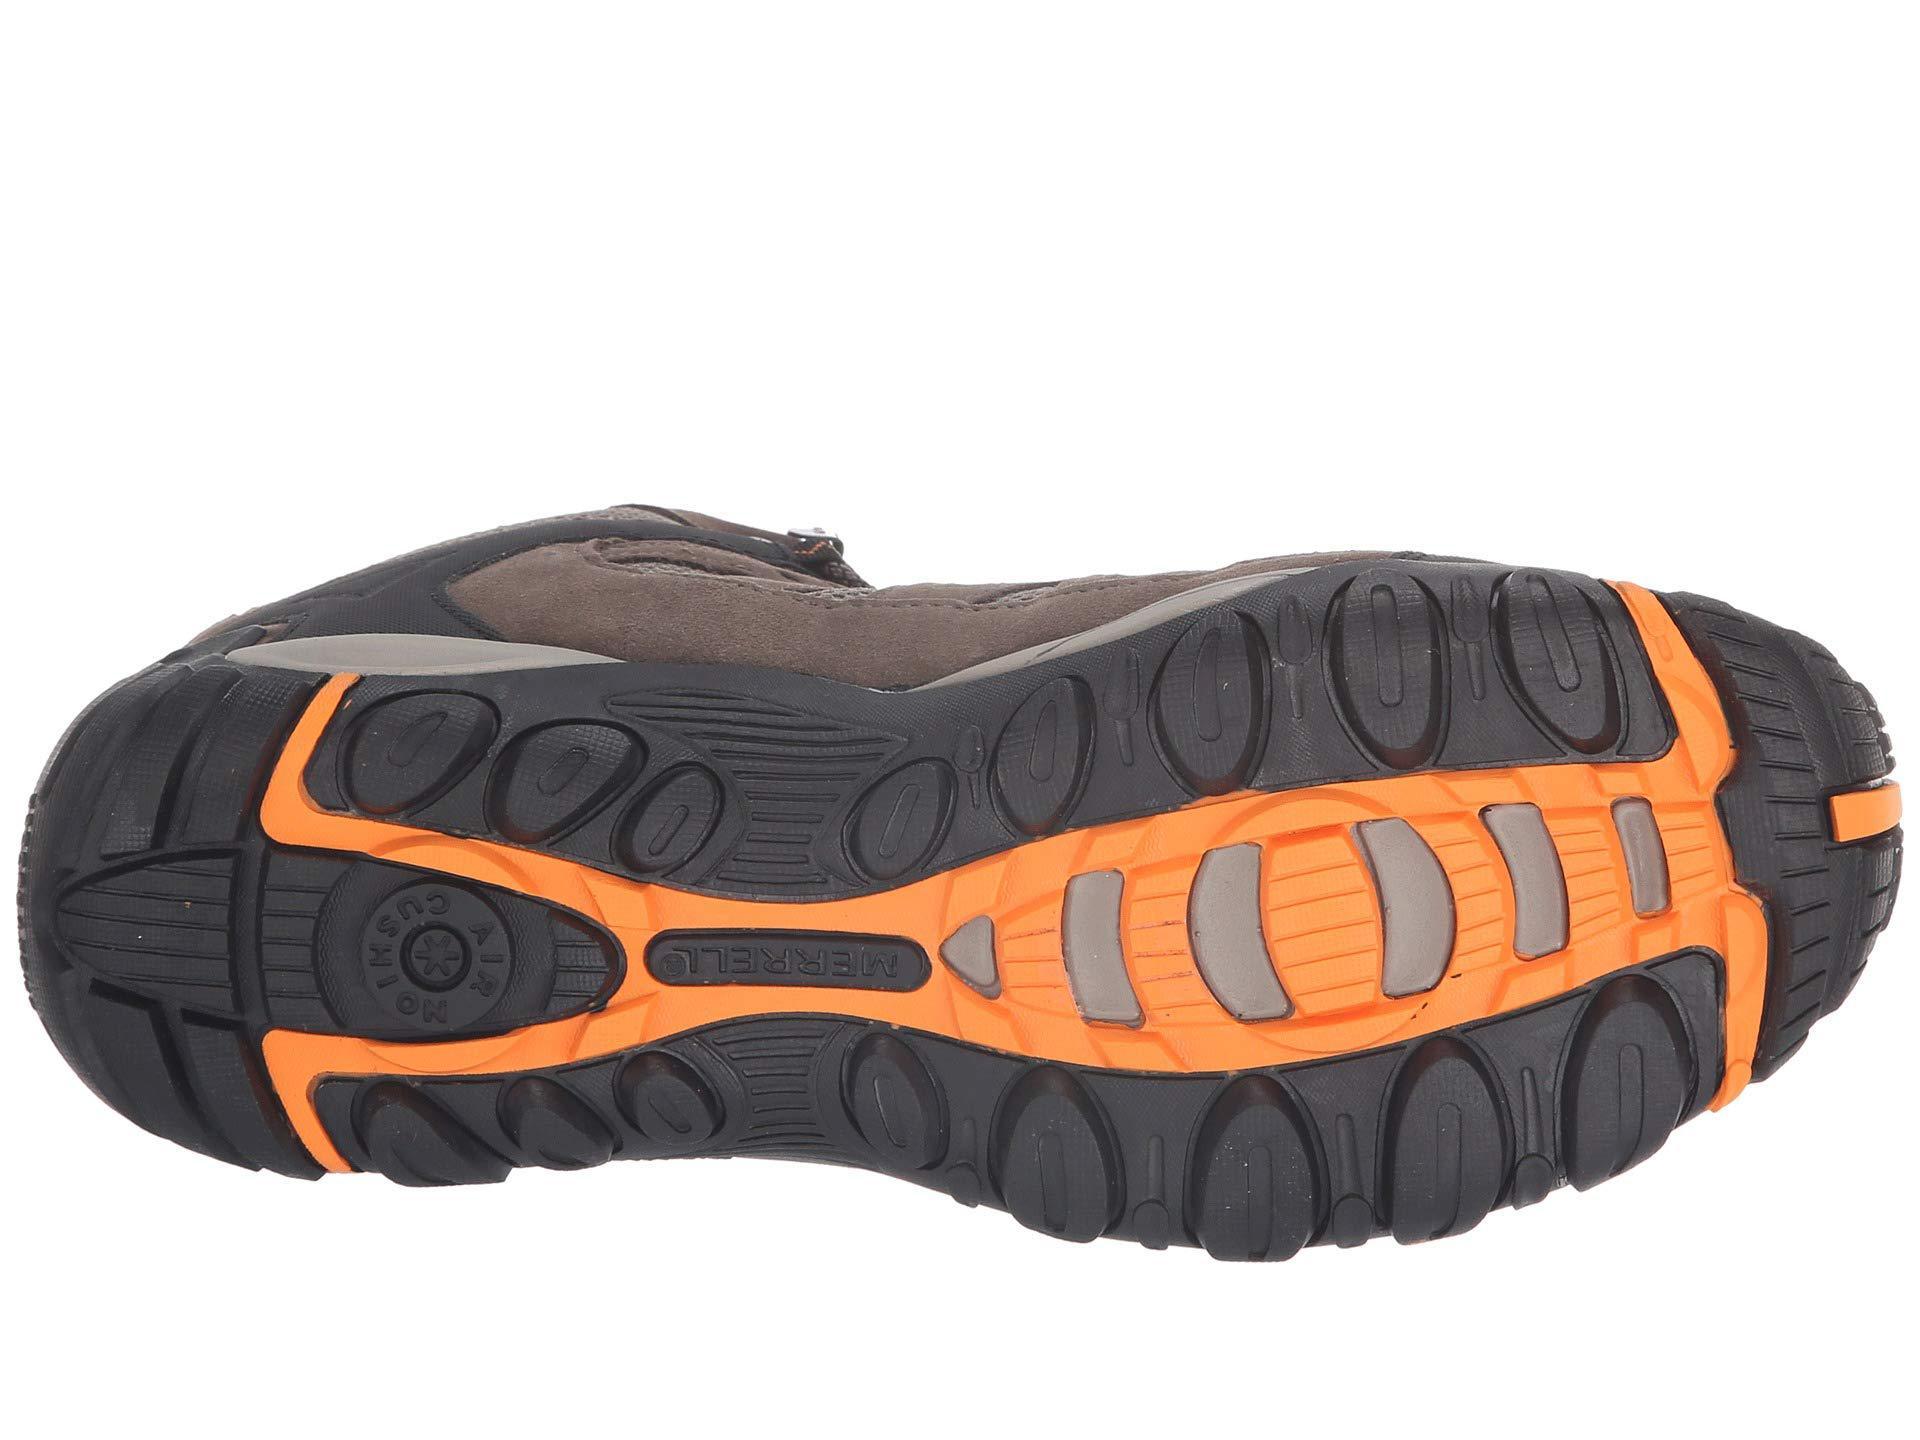 on wholesale offer discounts size 40 Merrell Suede Accentor Mid Vent Waterproof (boulder/orange) Men's ...